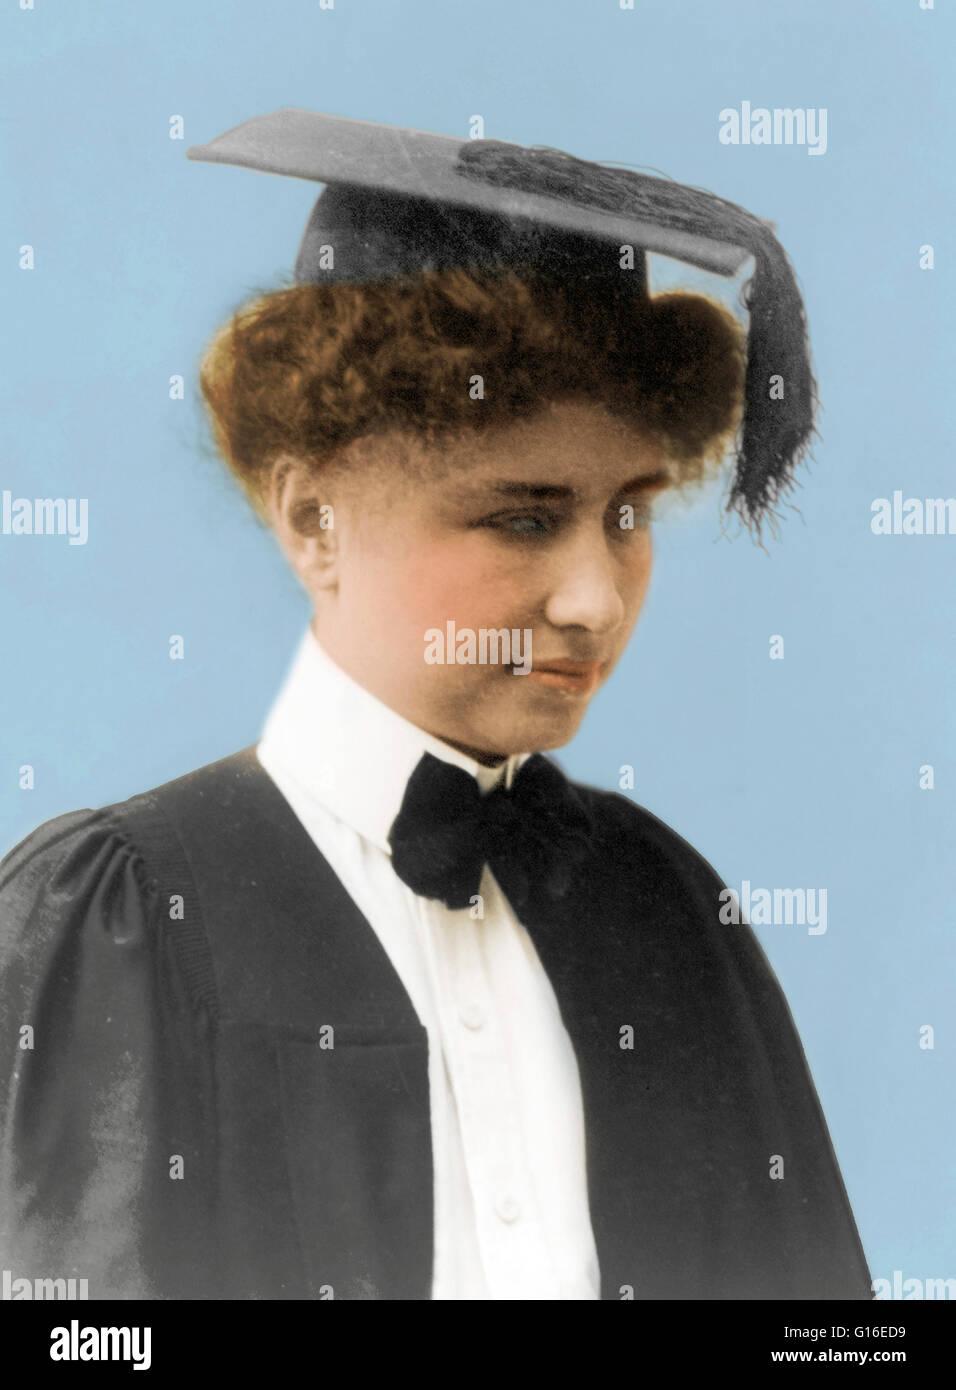 Keller wearing graduation cap and gown, circa 1904. Helen Adams ...